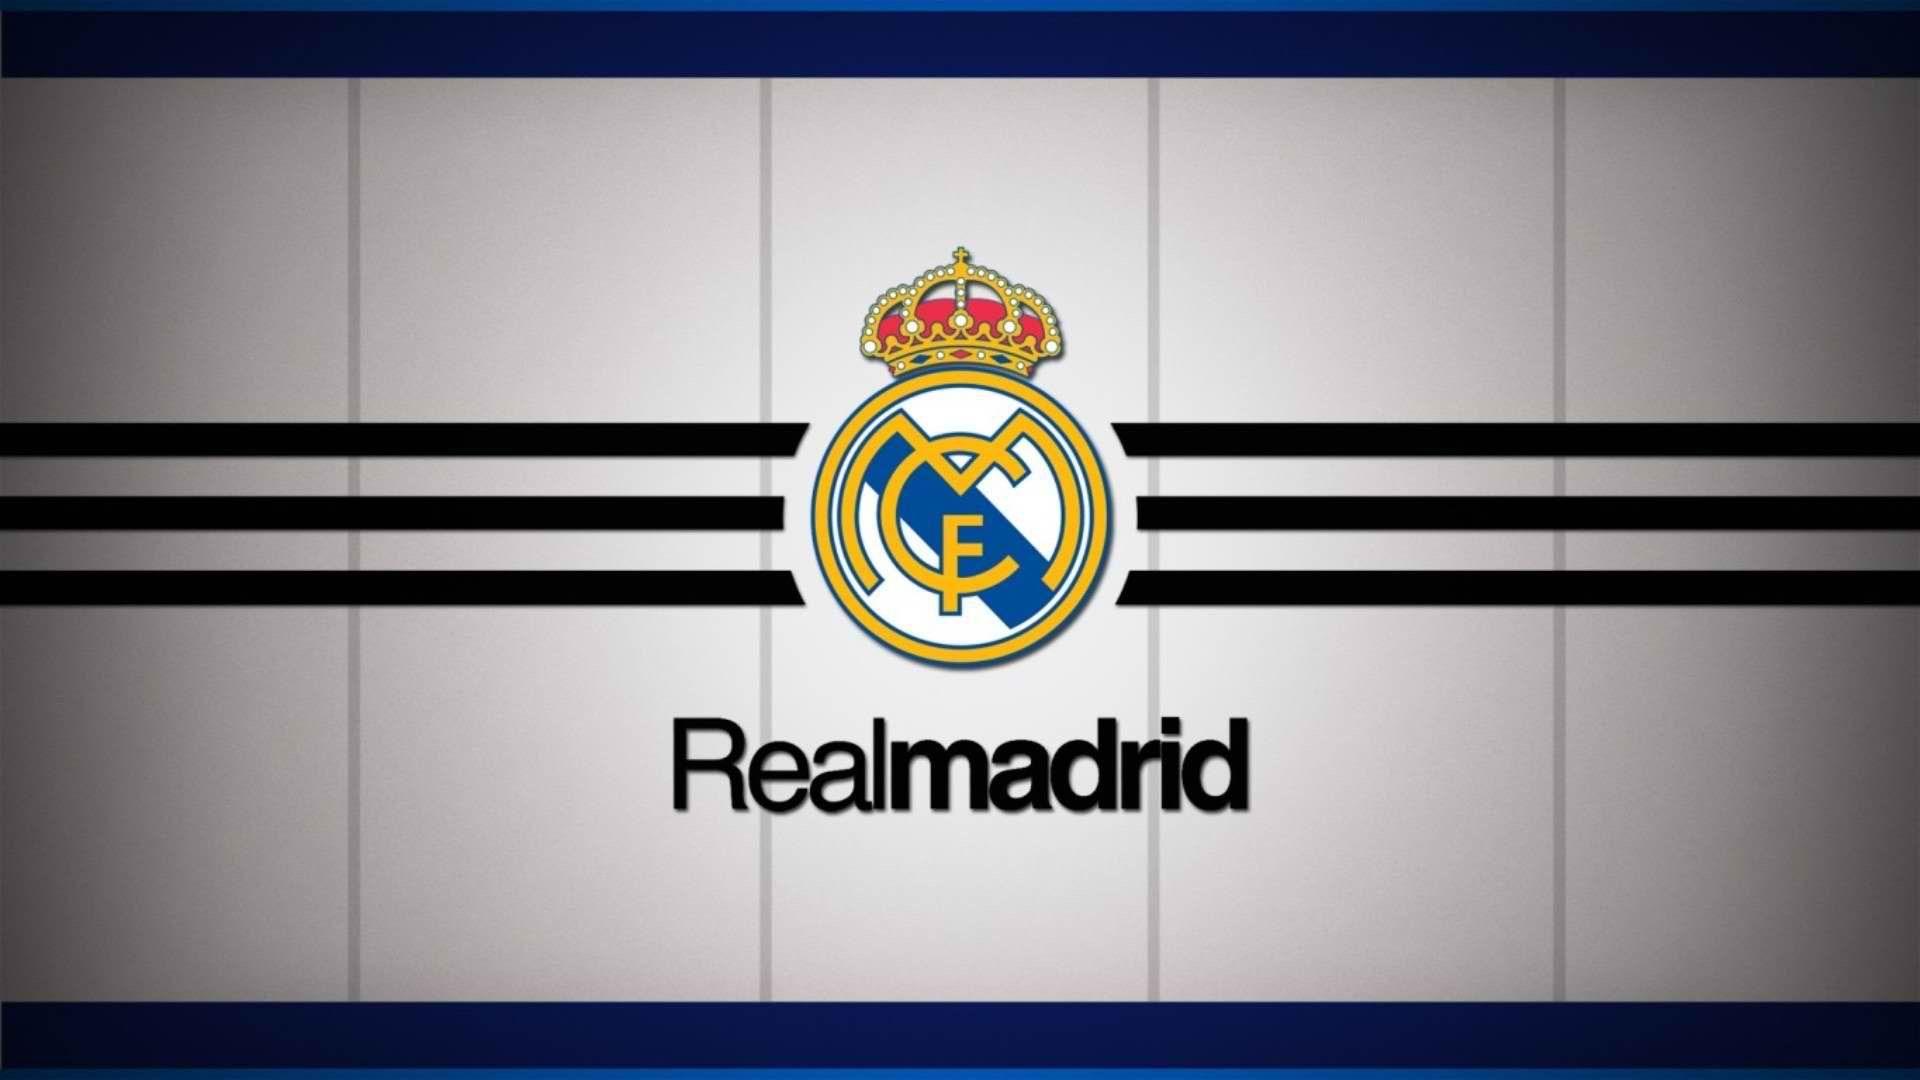 My Laptops Lock Screen Wallpaper Hala Madrid In 2020 Madrid Wallpaper Real Madrid Logo Real Madrid Logo Wallpapers